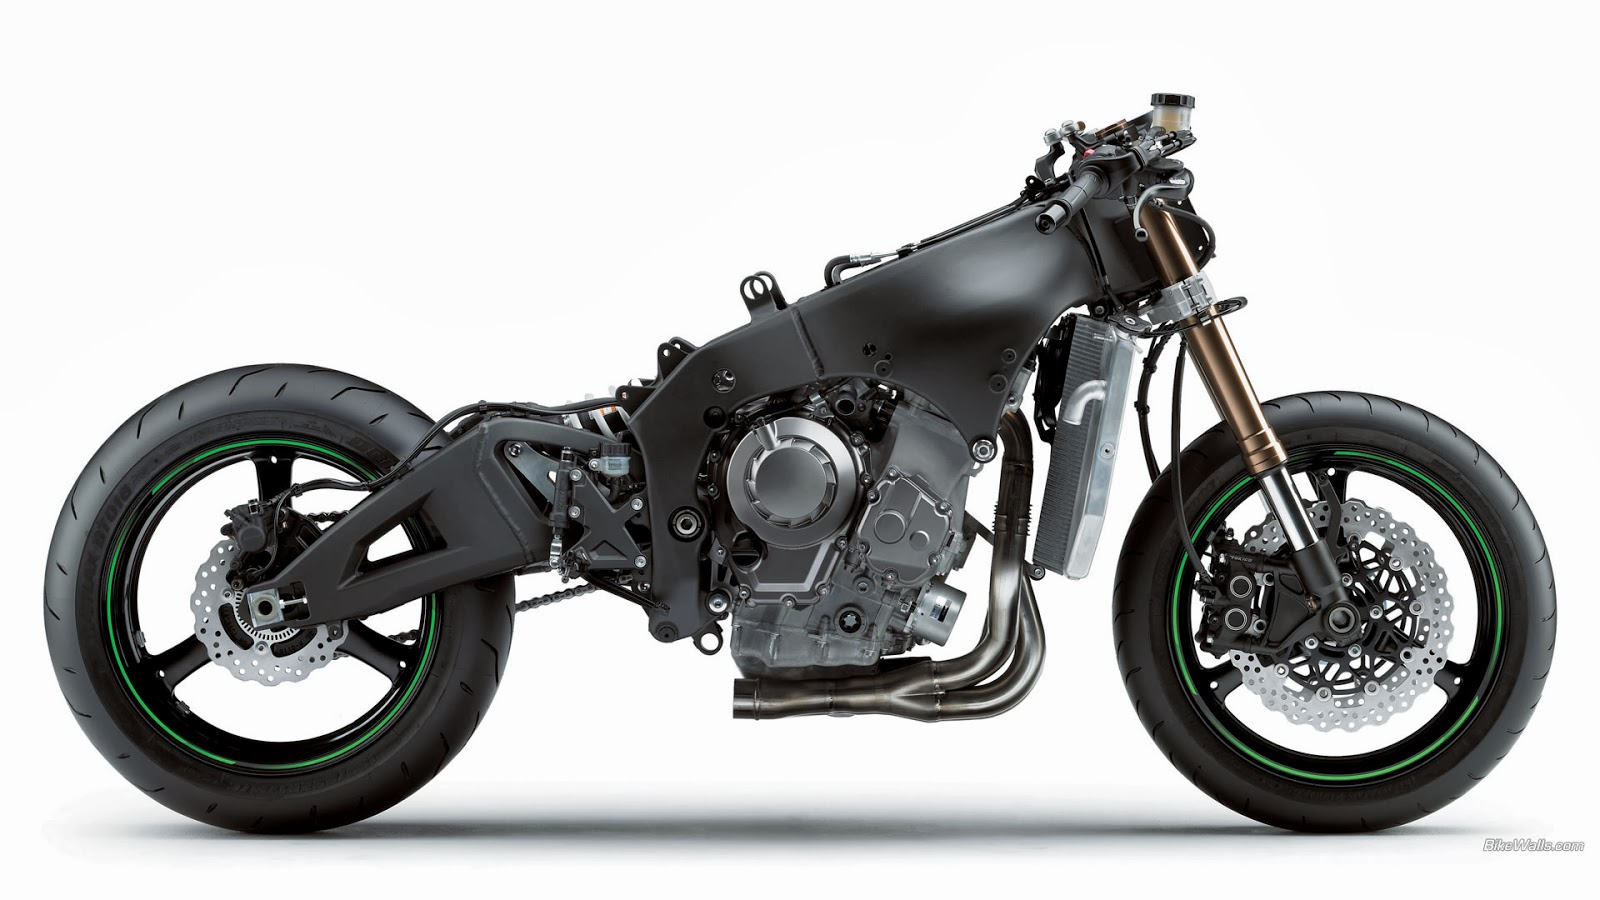 Modifikasi Motor Kawasaki Ninja ZX Ceper